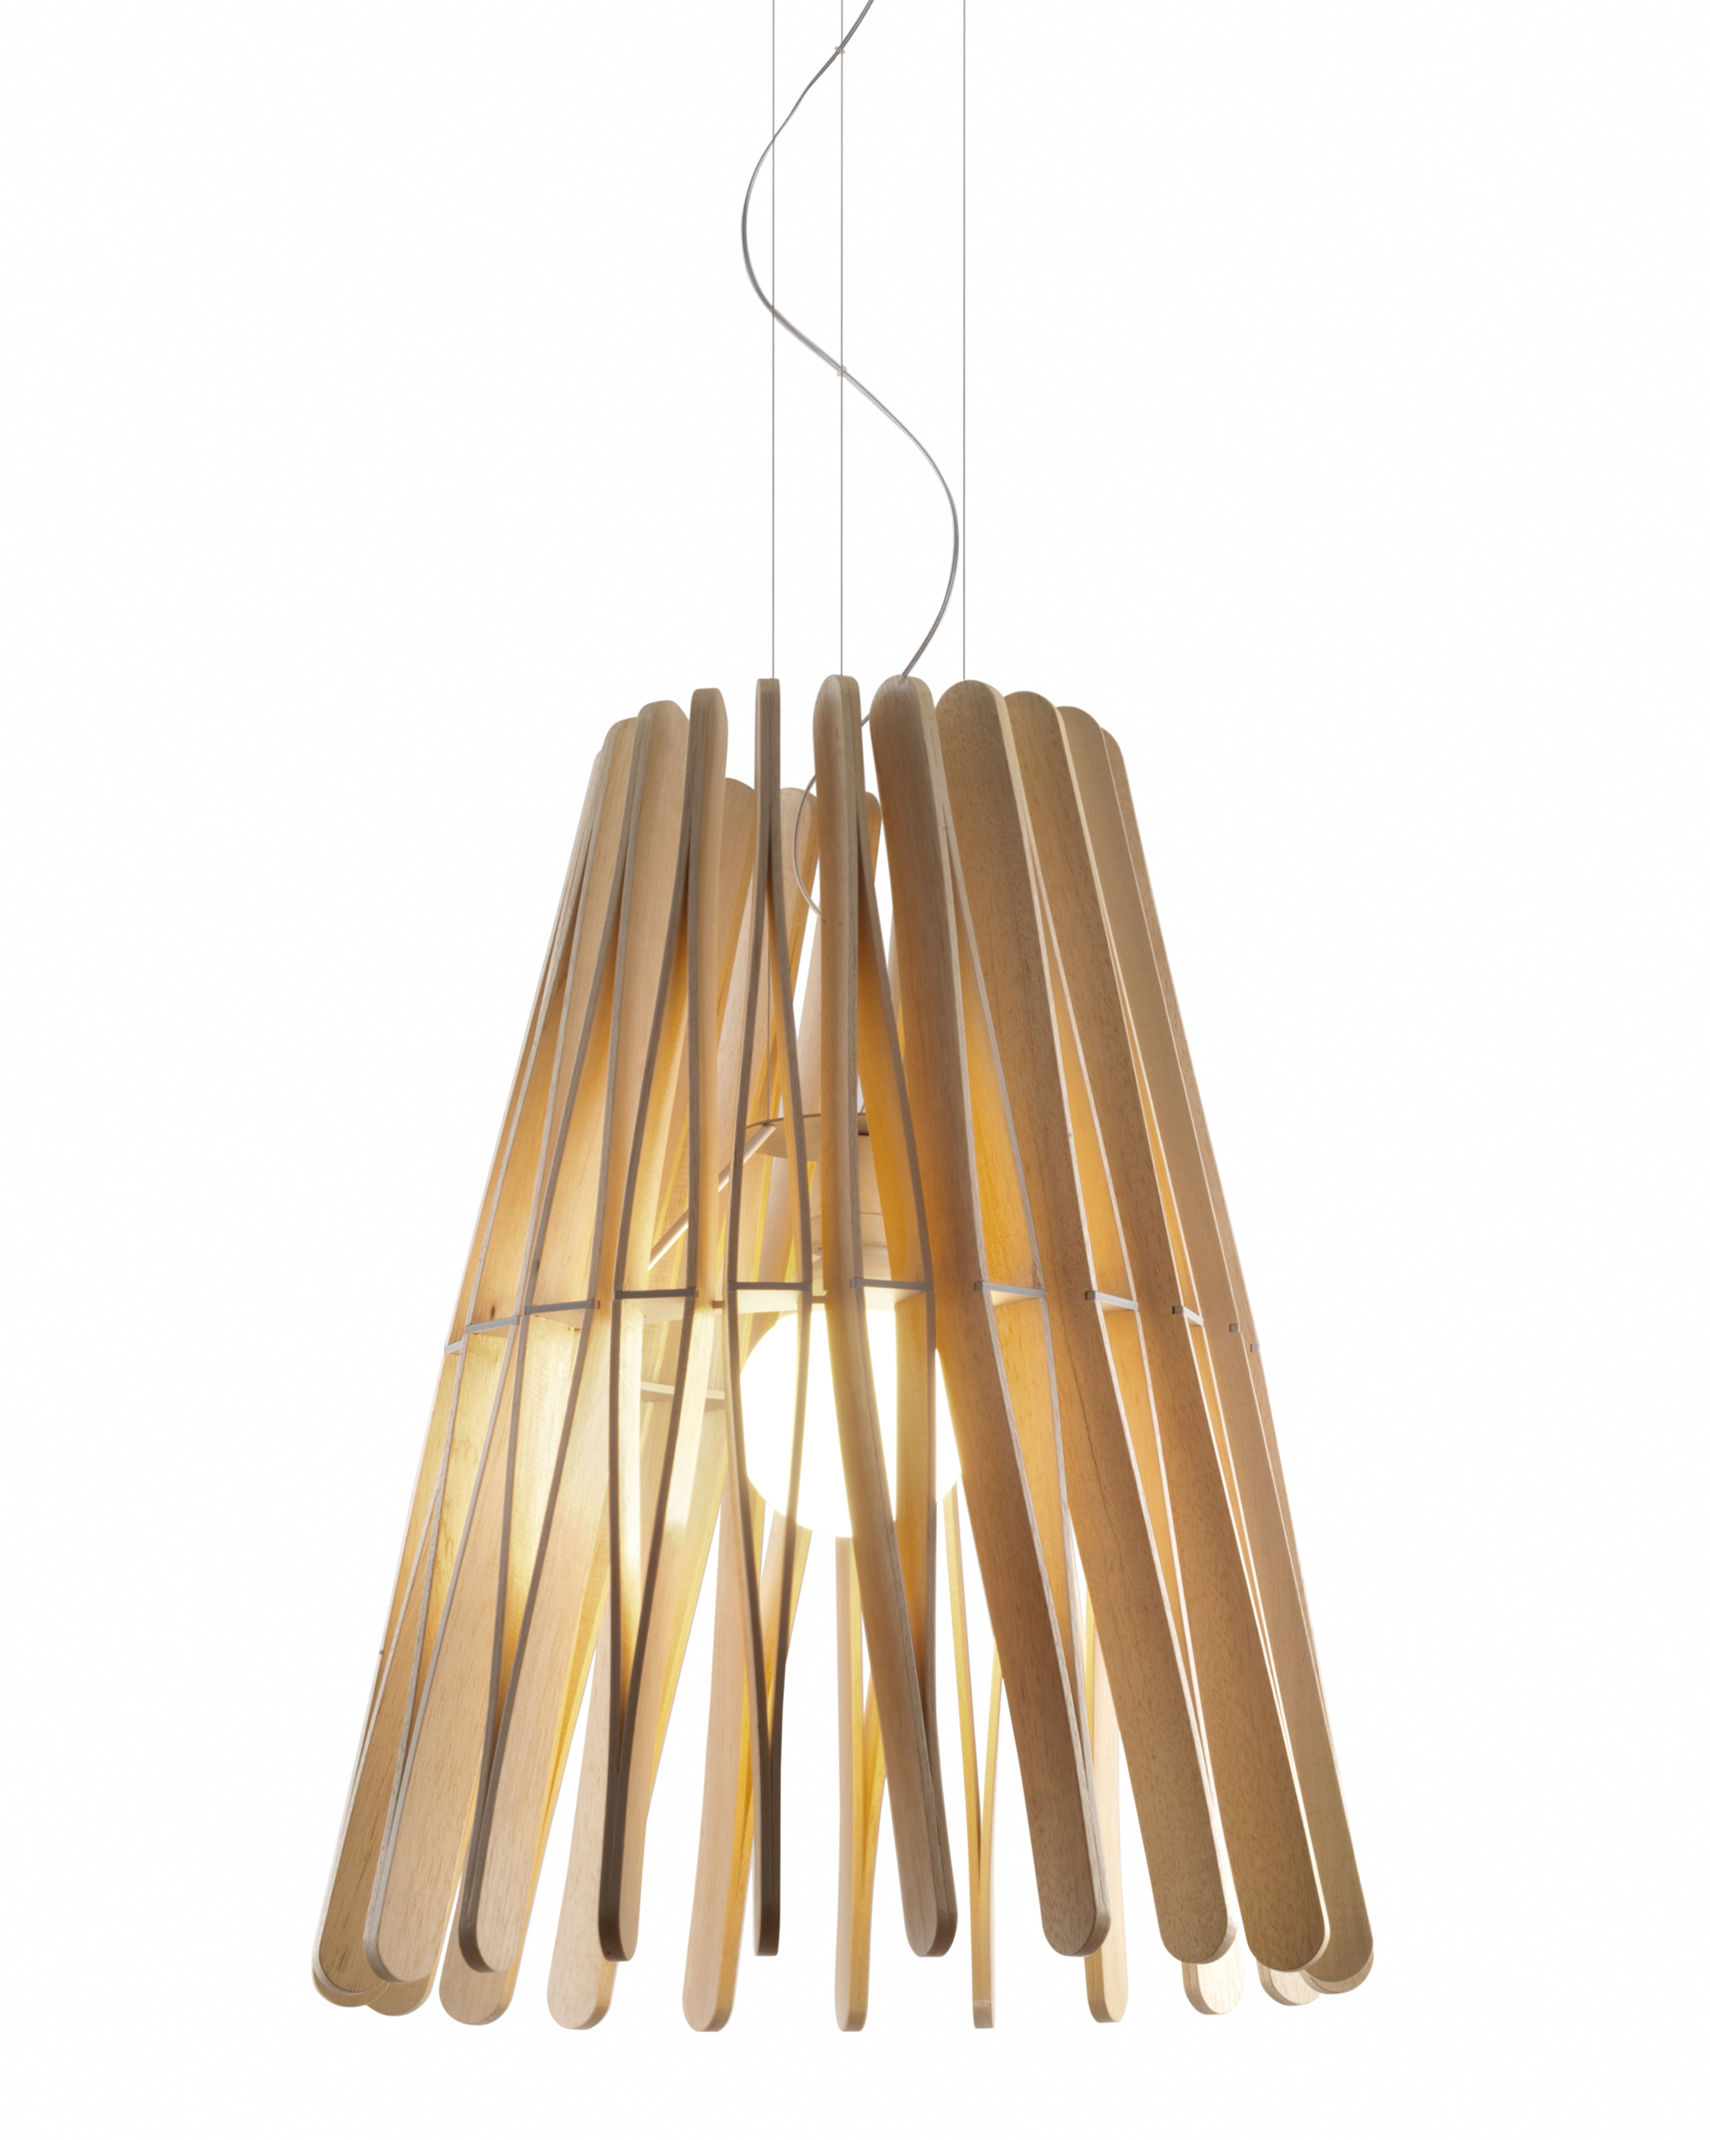 suspension stick 03 50 x h 64 cm bois clair mod le 3 fabbian made in design. Black Bedroom Furniture Sets. Home Design Ideas